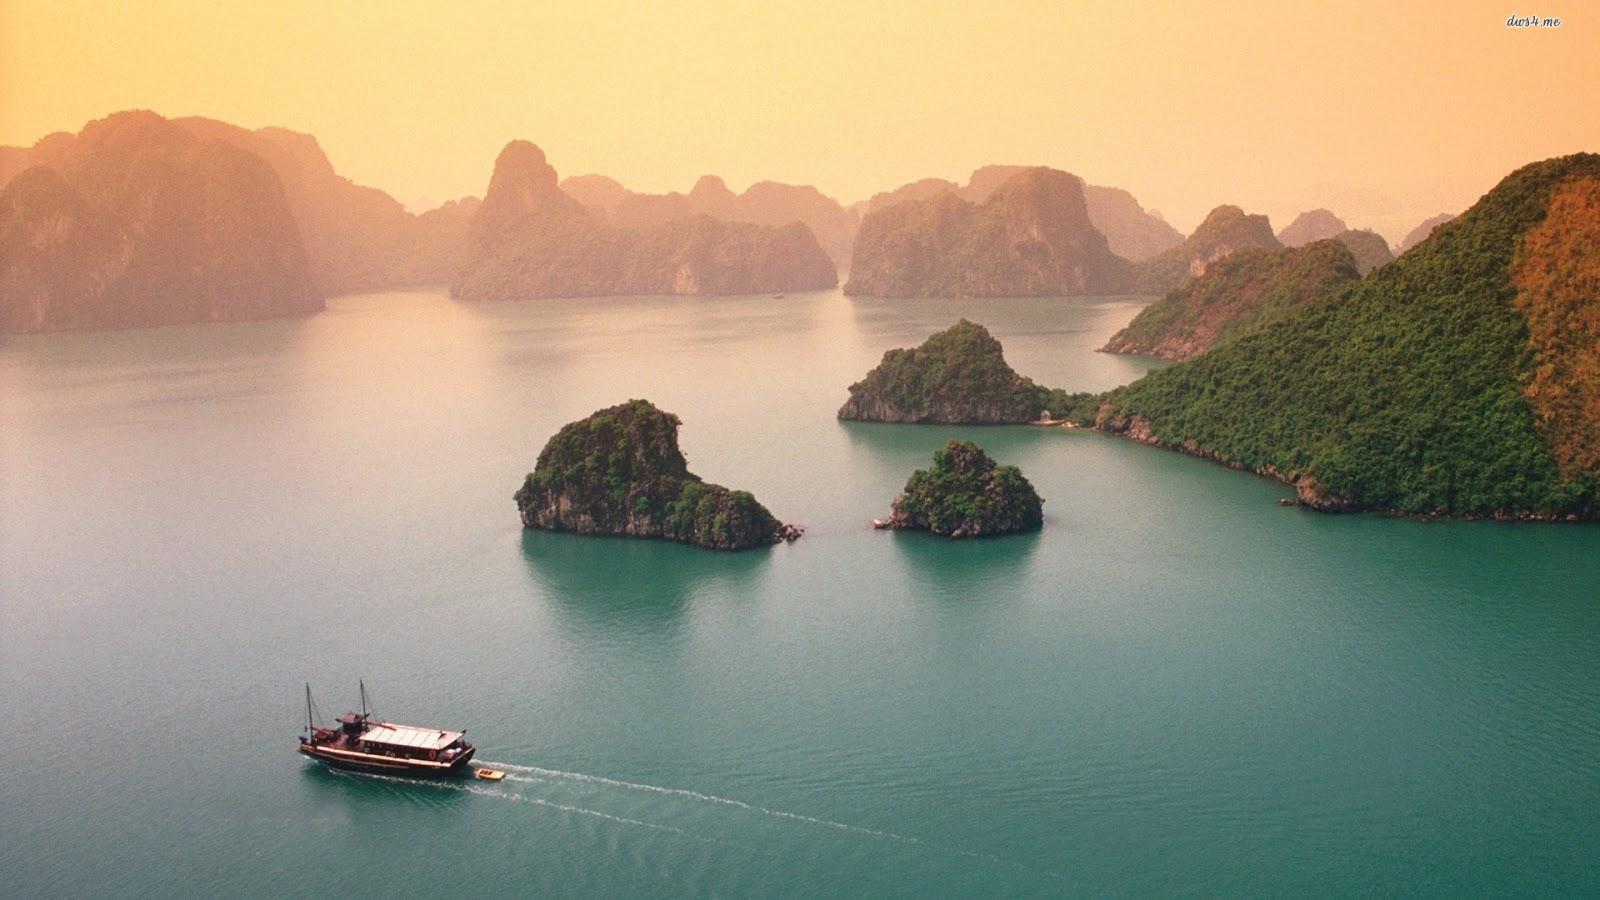 vietnam wallpaper images